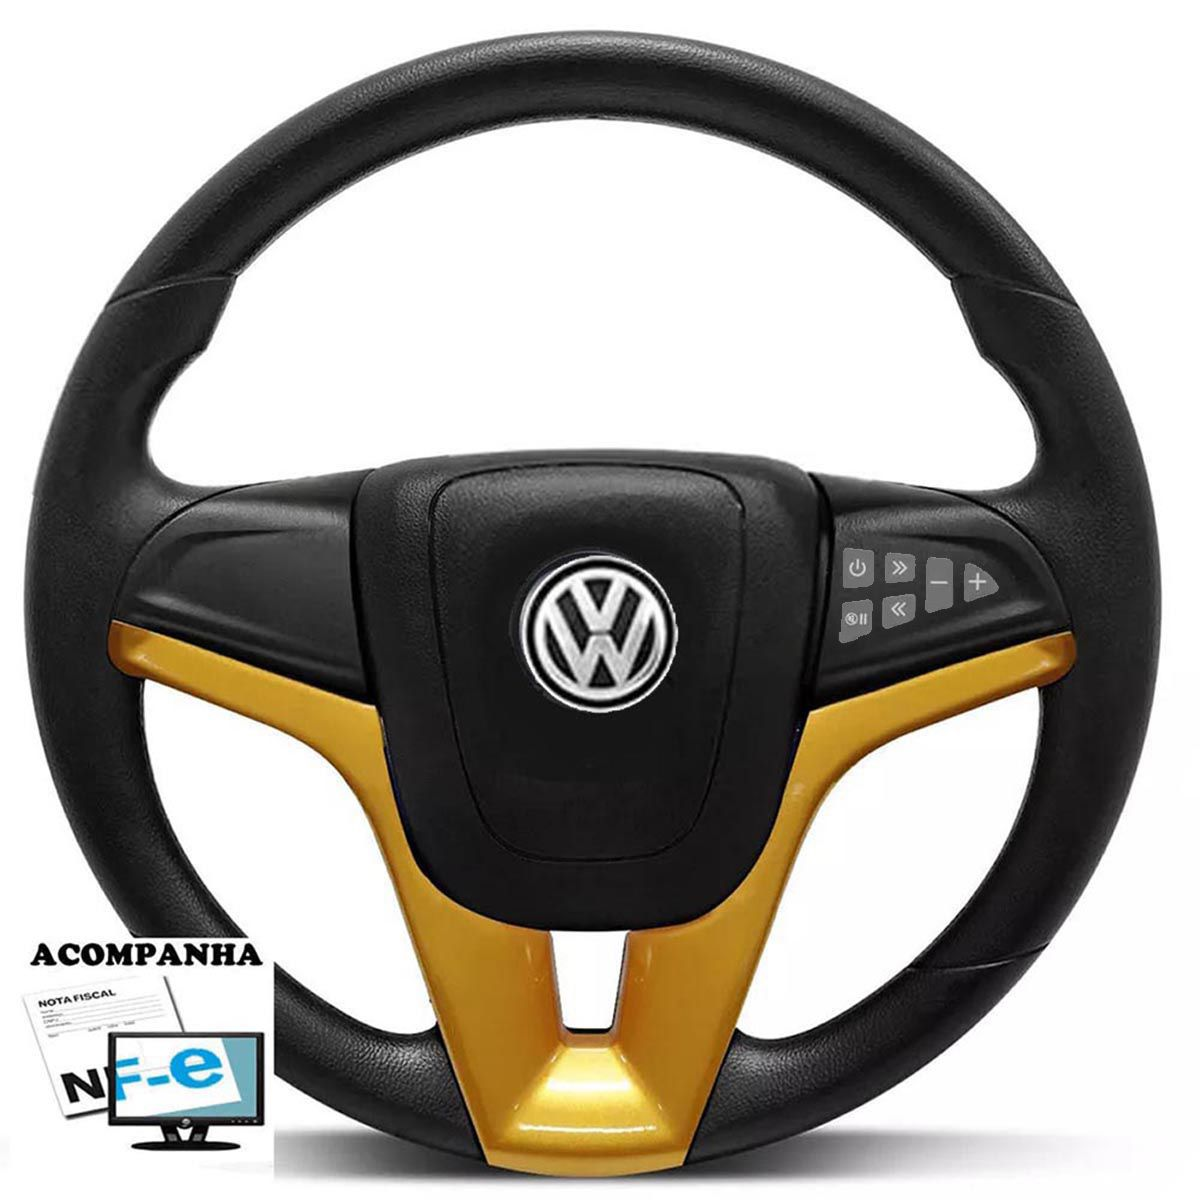 Volante Multifuncional Cruze Gol Parati Saveiro Voyagen G1 G2 G3 G4 G5 Golf Fusca Brasilia Polo Kombi Santana Passat Volkswagen + Cubo Vw